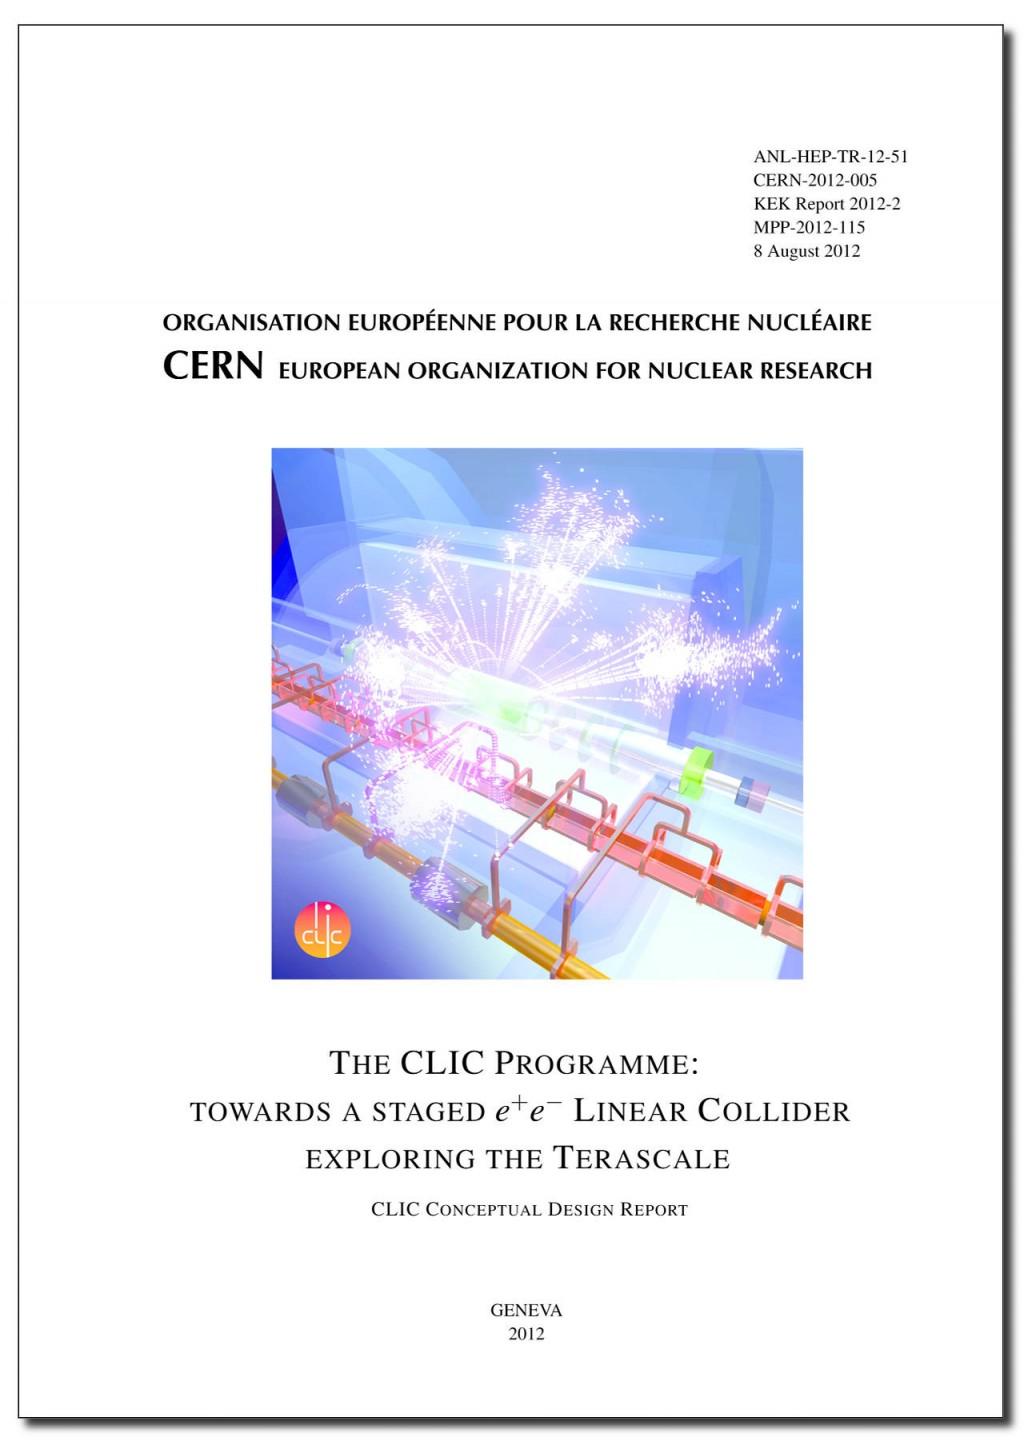 Volume 3 of the Conceptual Design Report